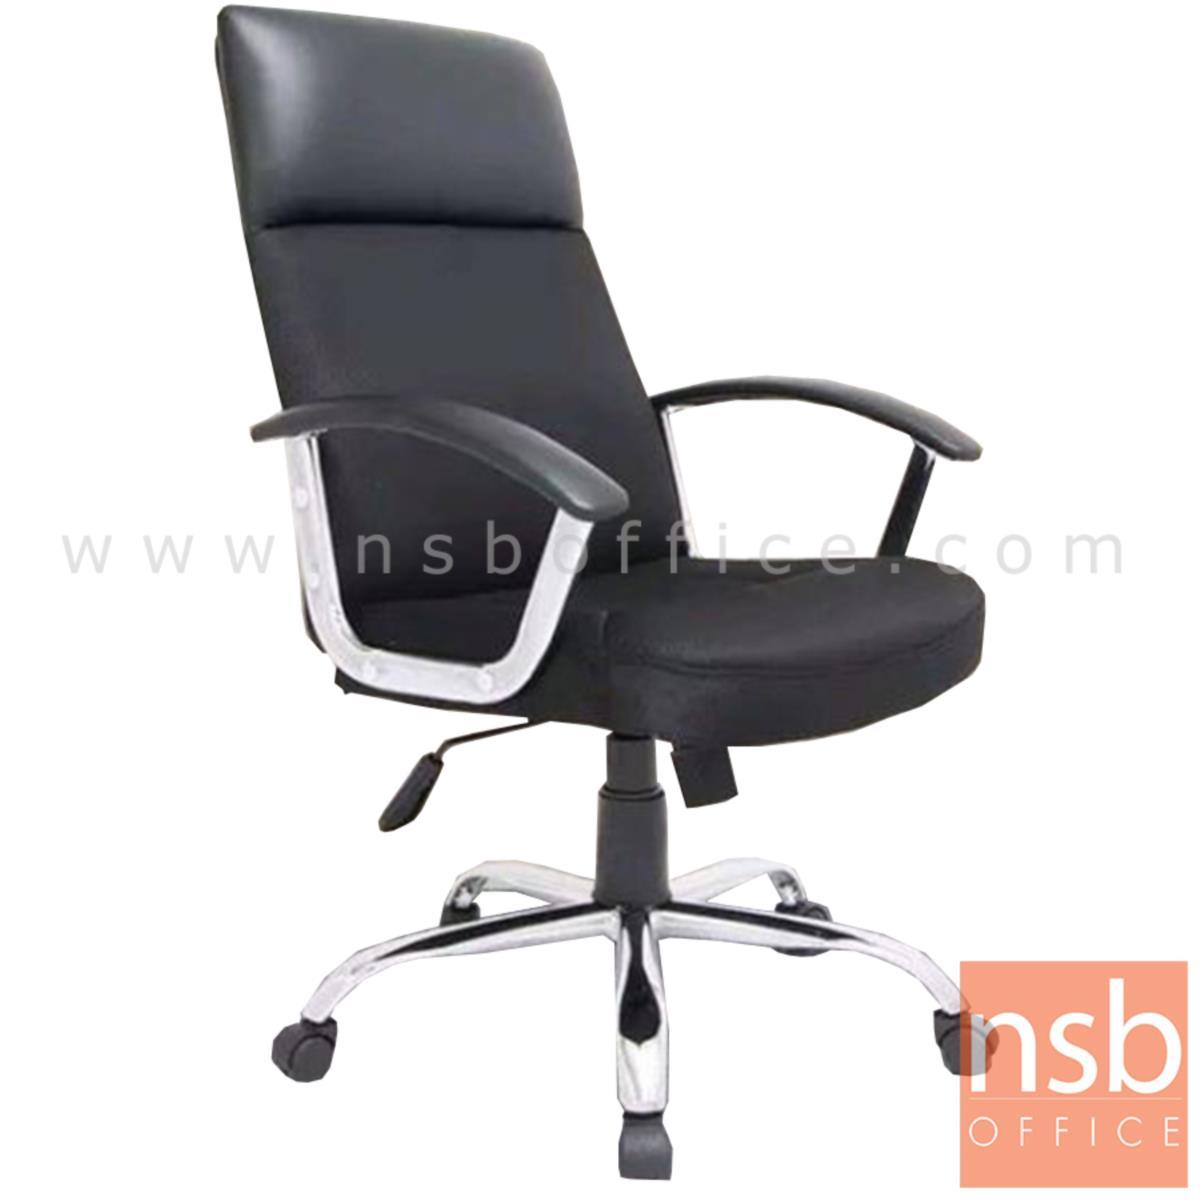 B01A471:เก้าอี้ผู้บริหาร รุ่น Cordelia (คอเดลเลีย)  โช๊คแก๊ส มีก้อนโยก ขาเหล็กชุบโครเมี่ยม